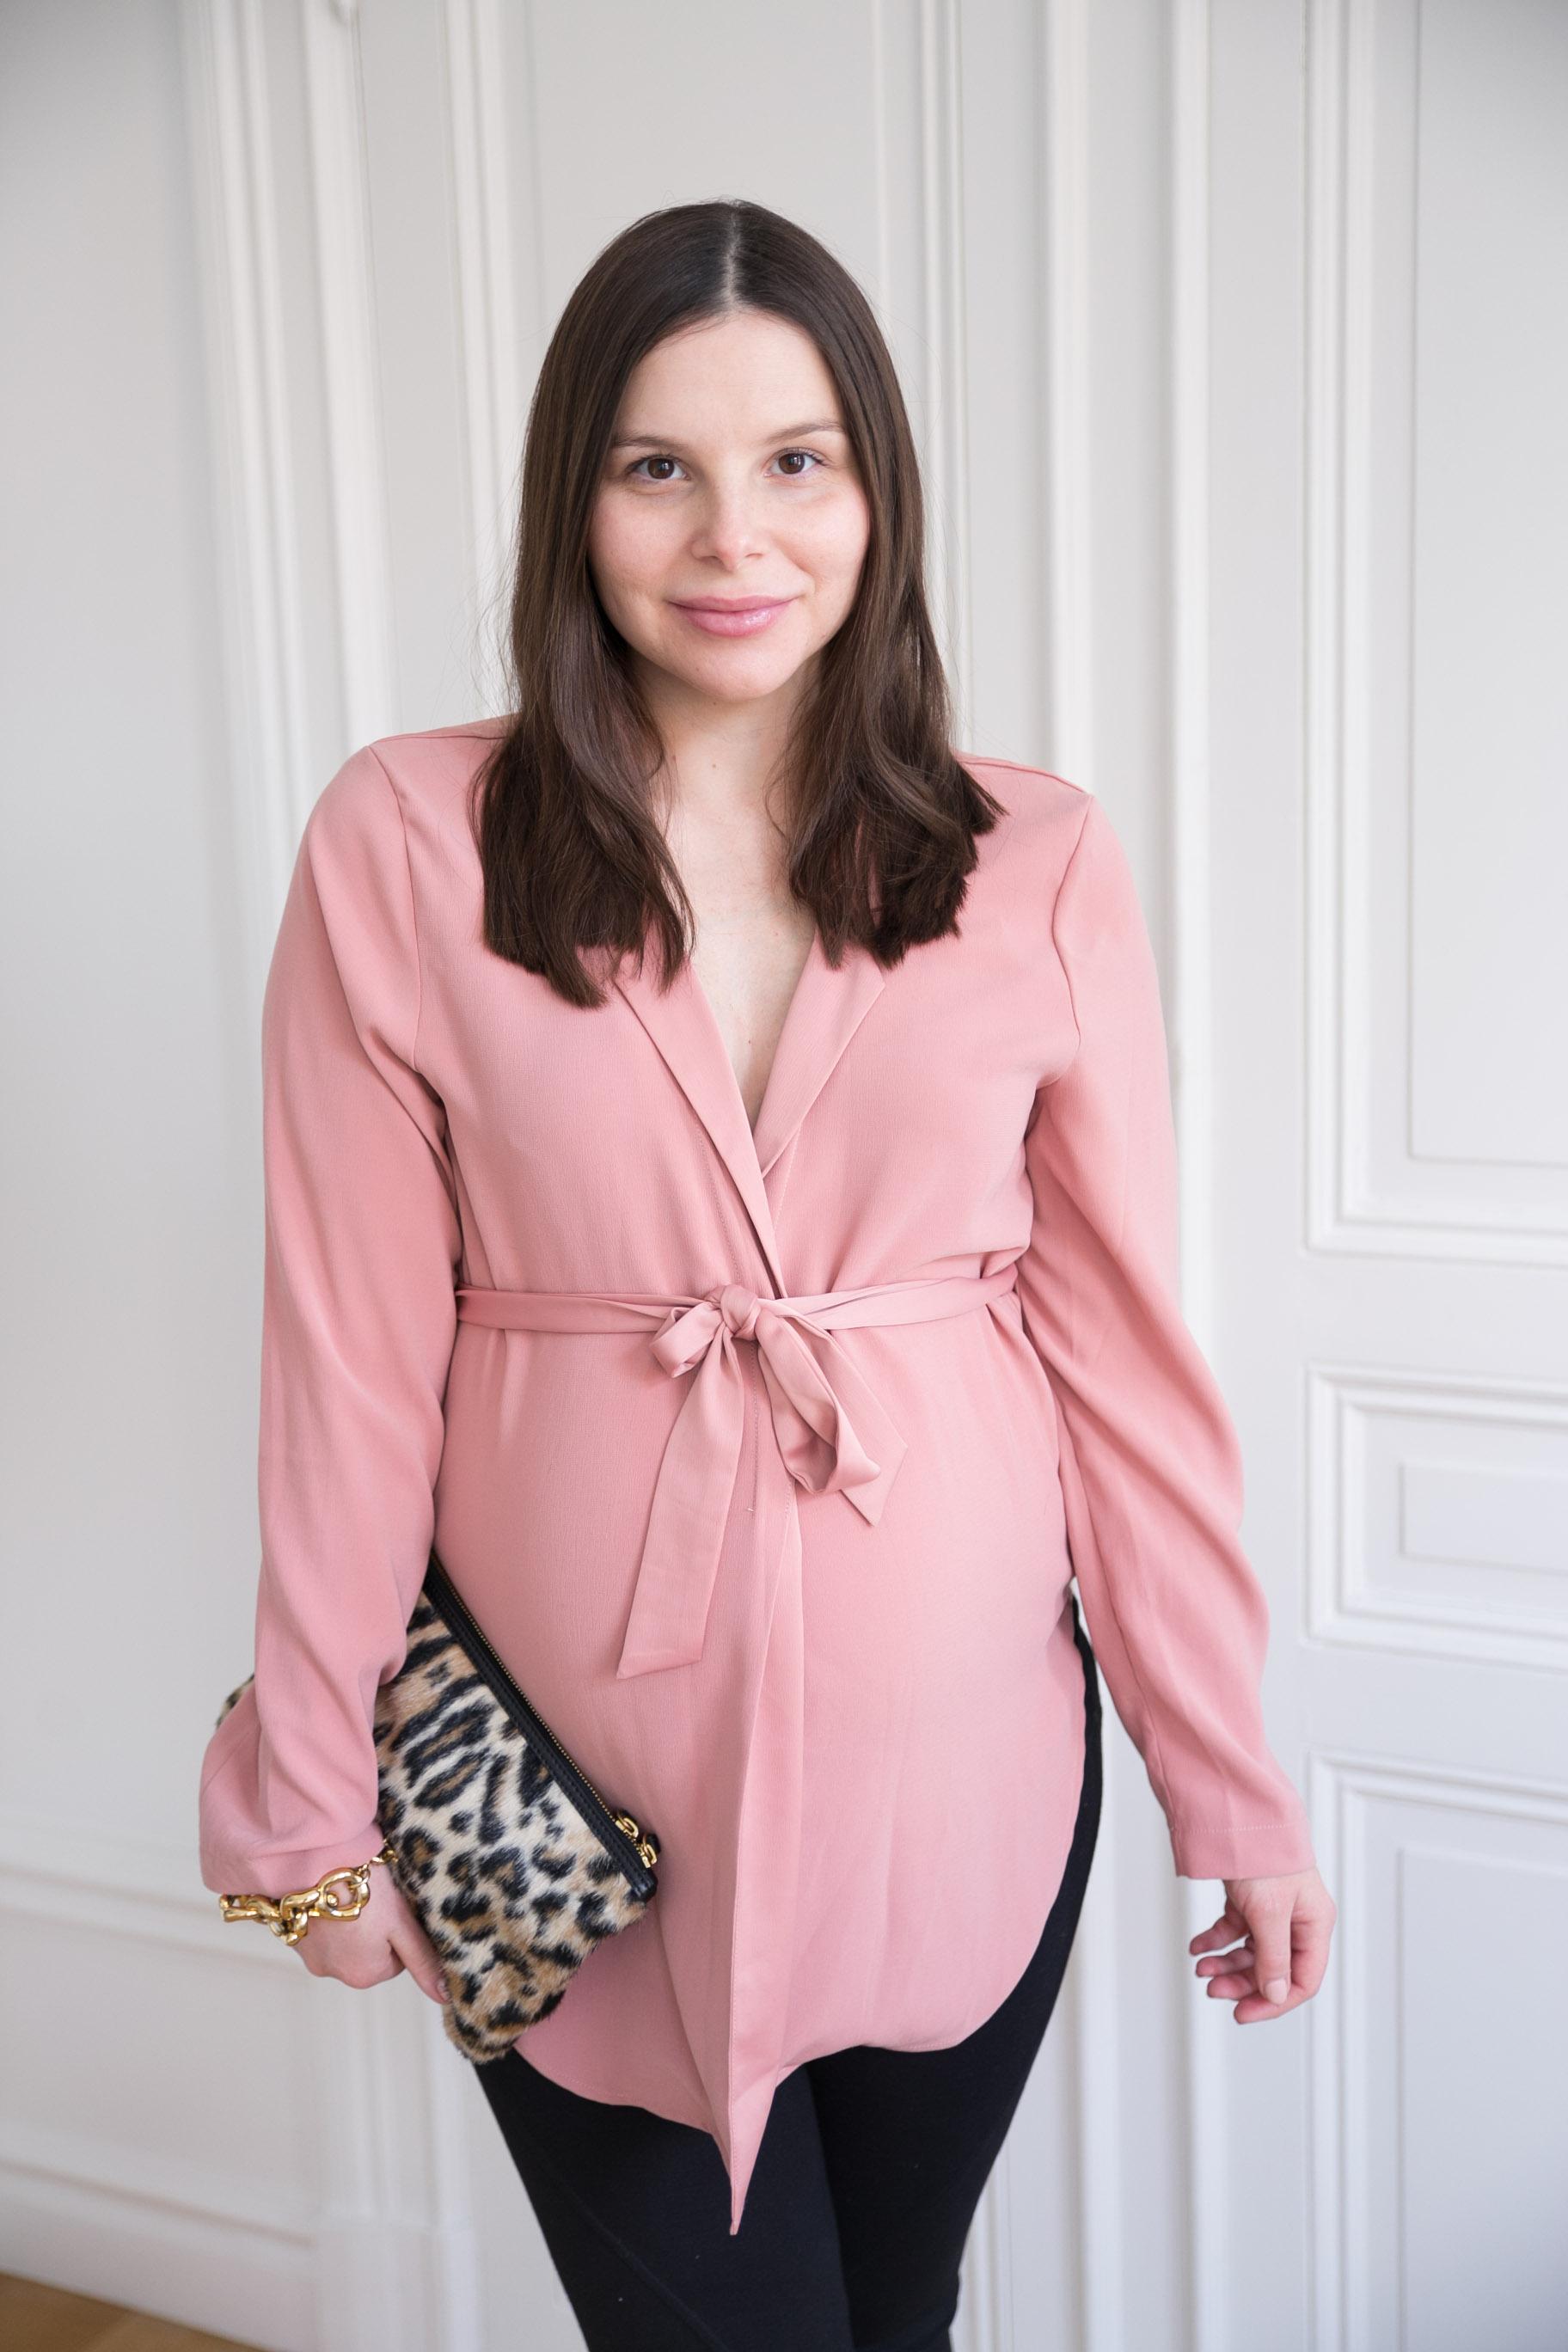 Angelica Aurell gravid vecka 34.jpg